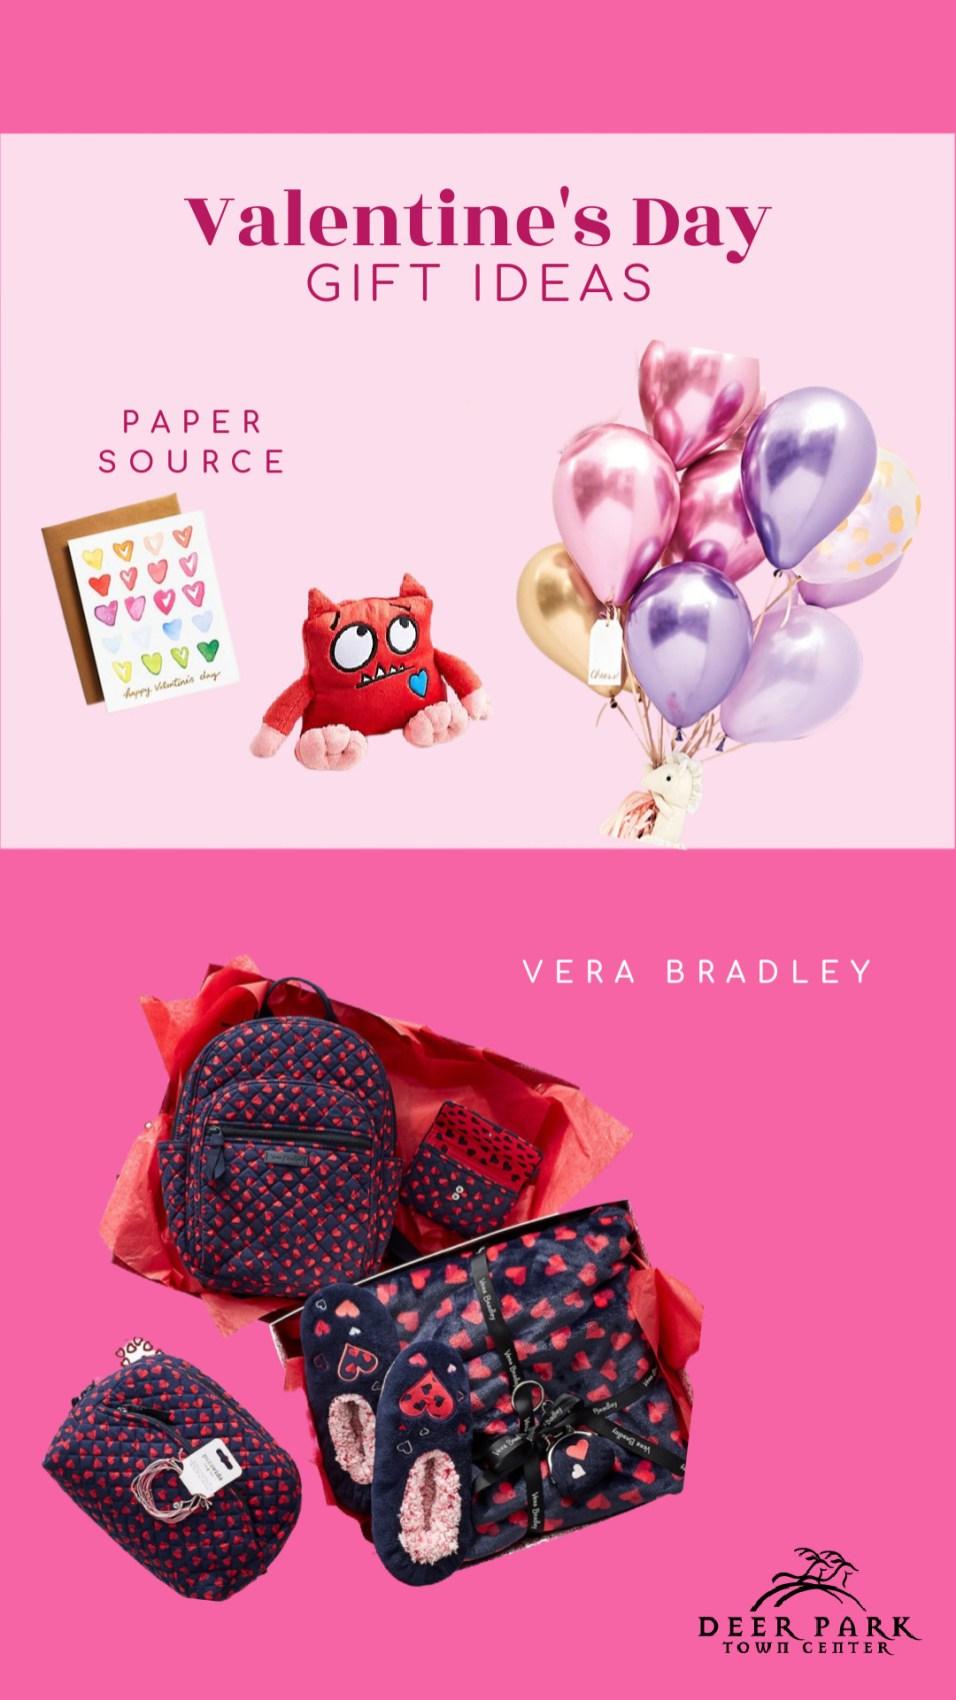 Deer Park Town Center - Valentine's Day Gifts 2021 - 5